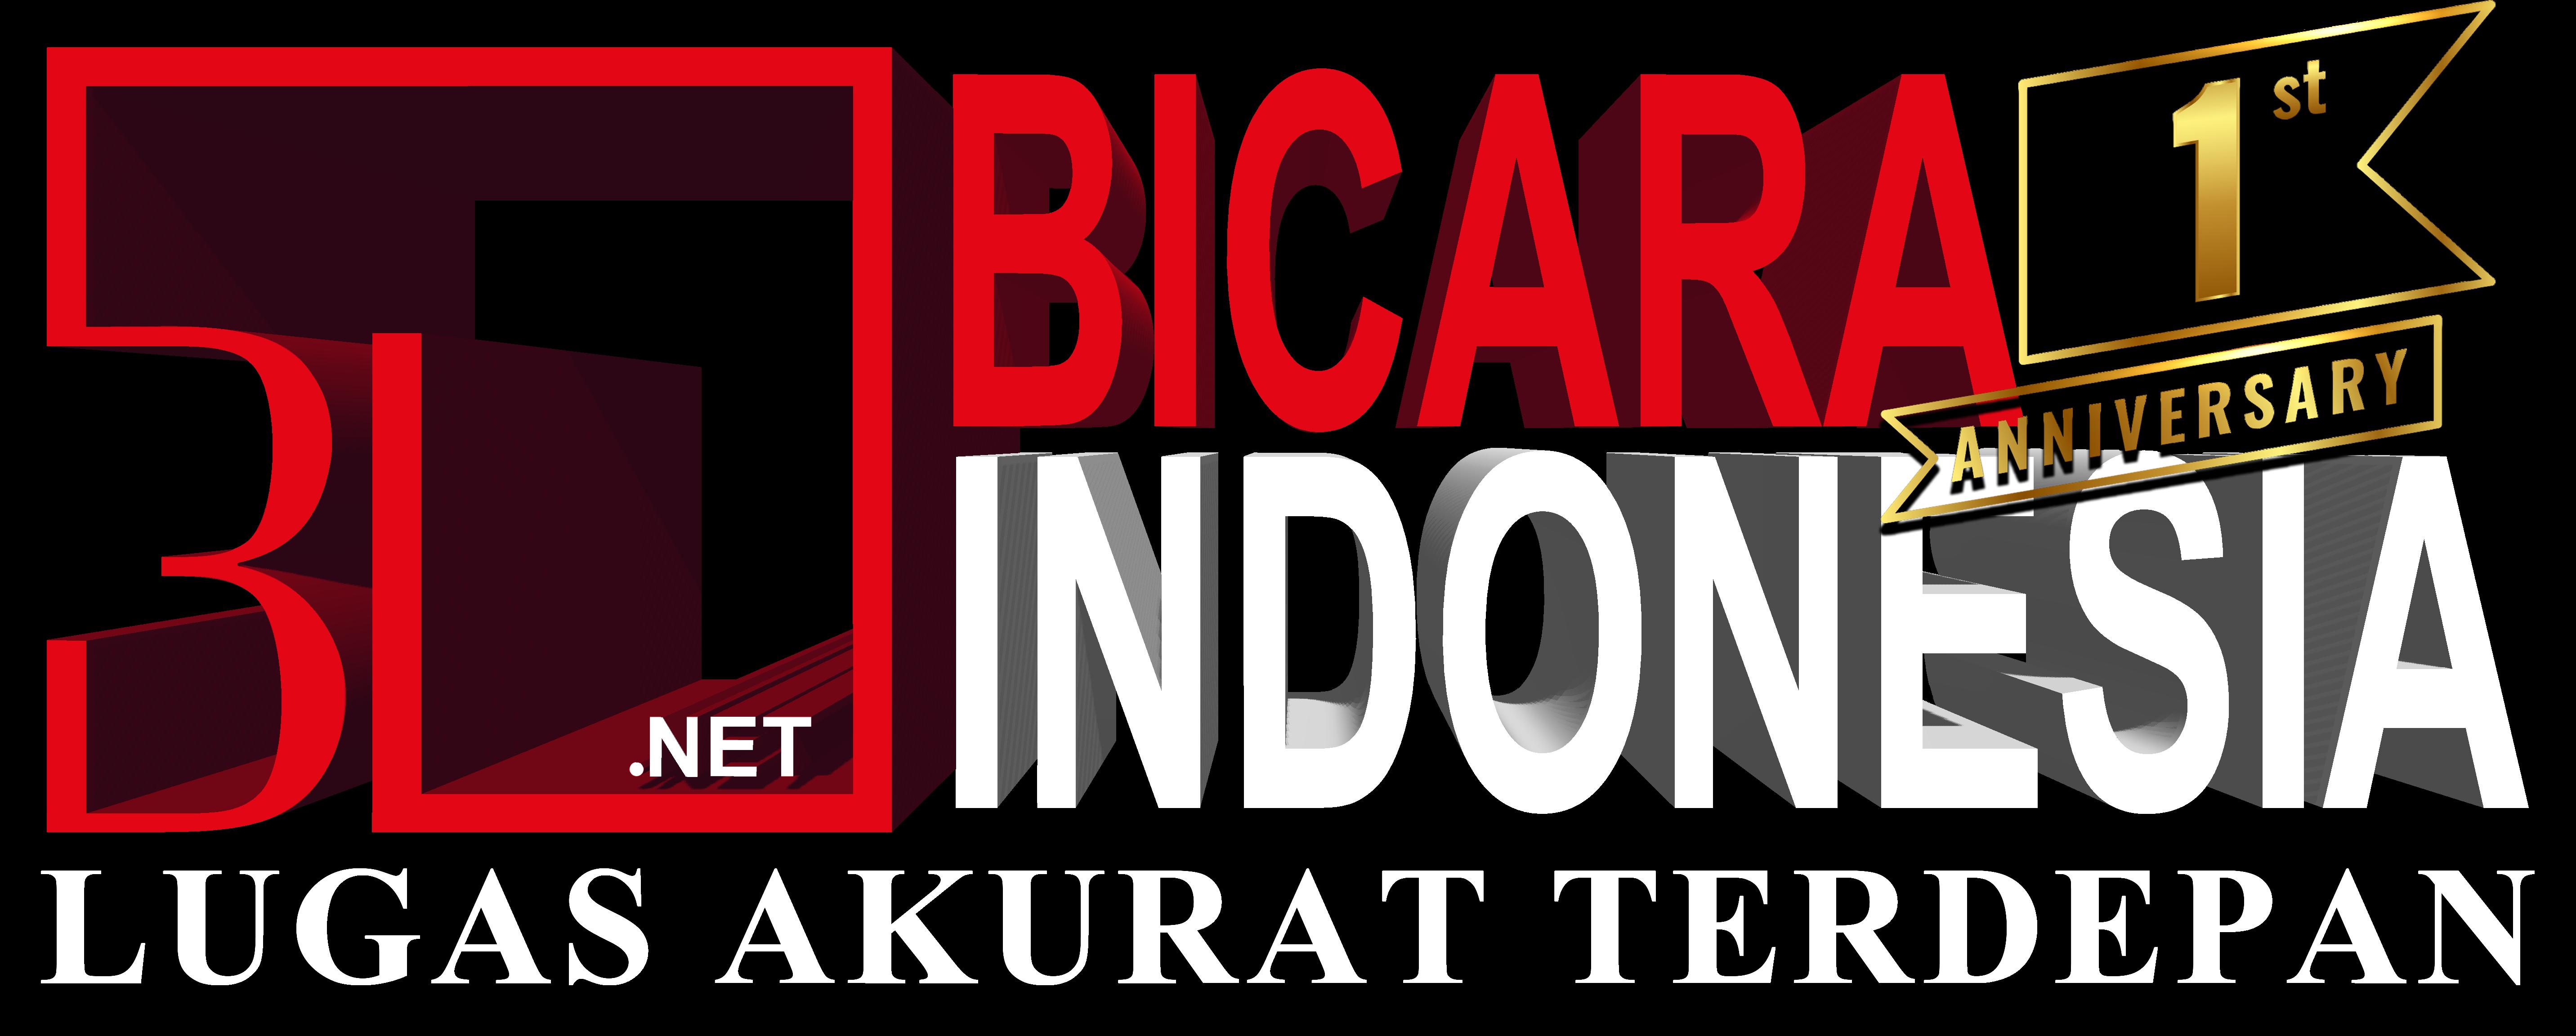 BicaraIndonesia.net